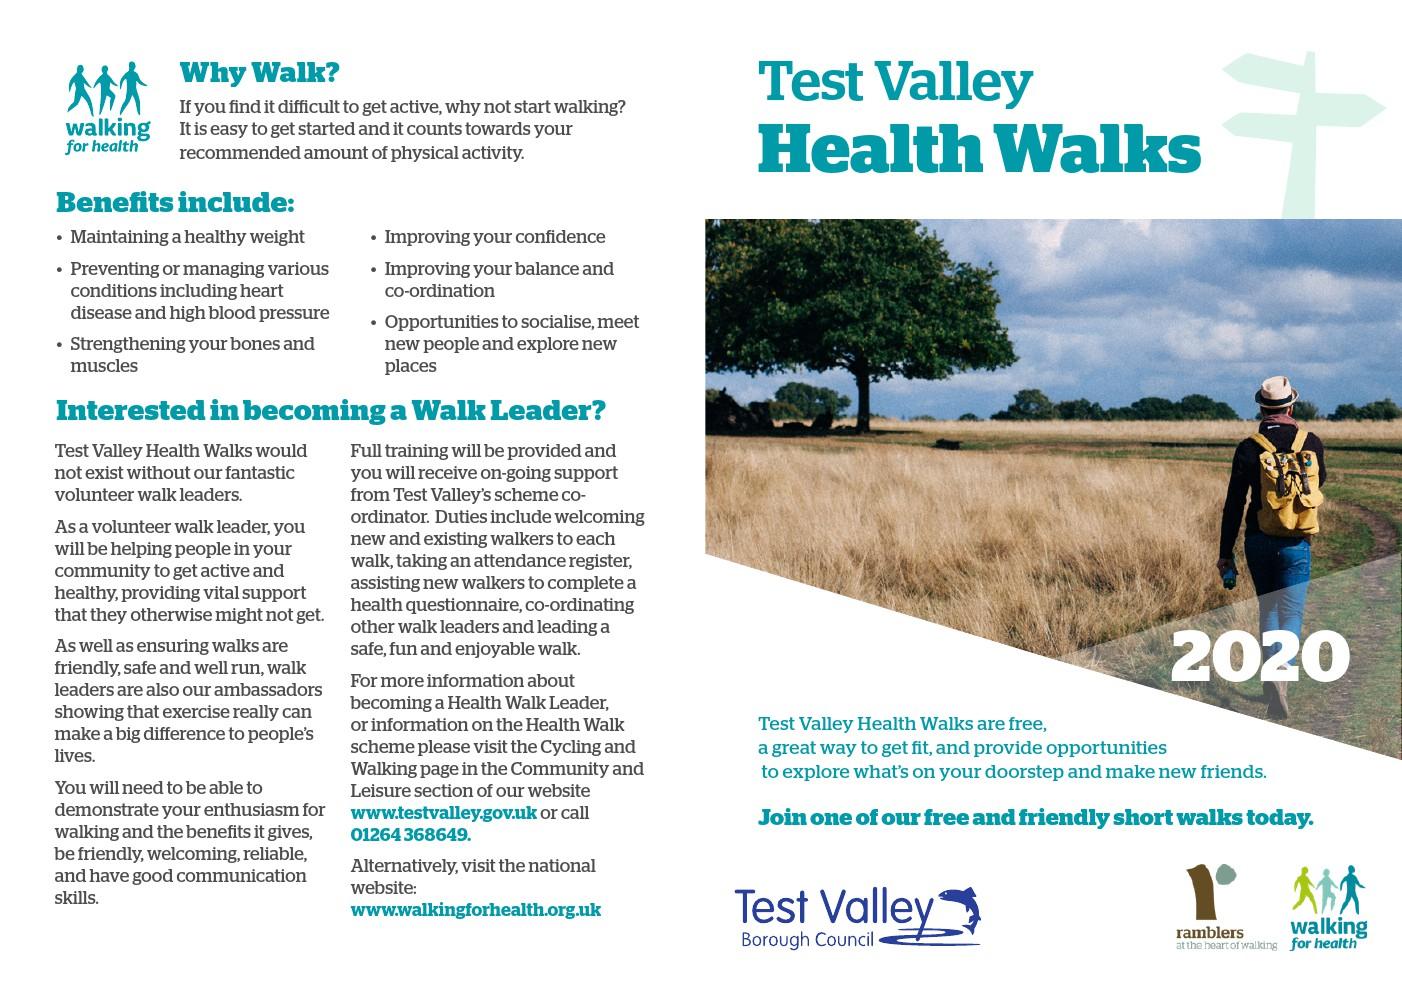 Andover & Romsey Health Walks 2020